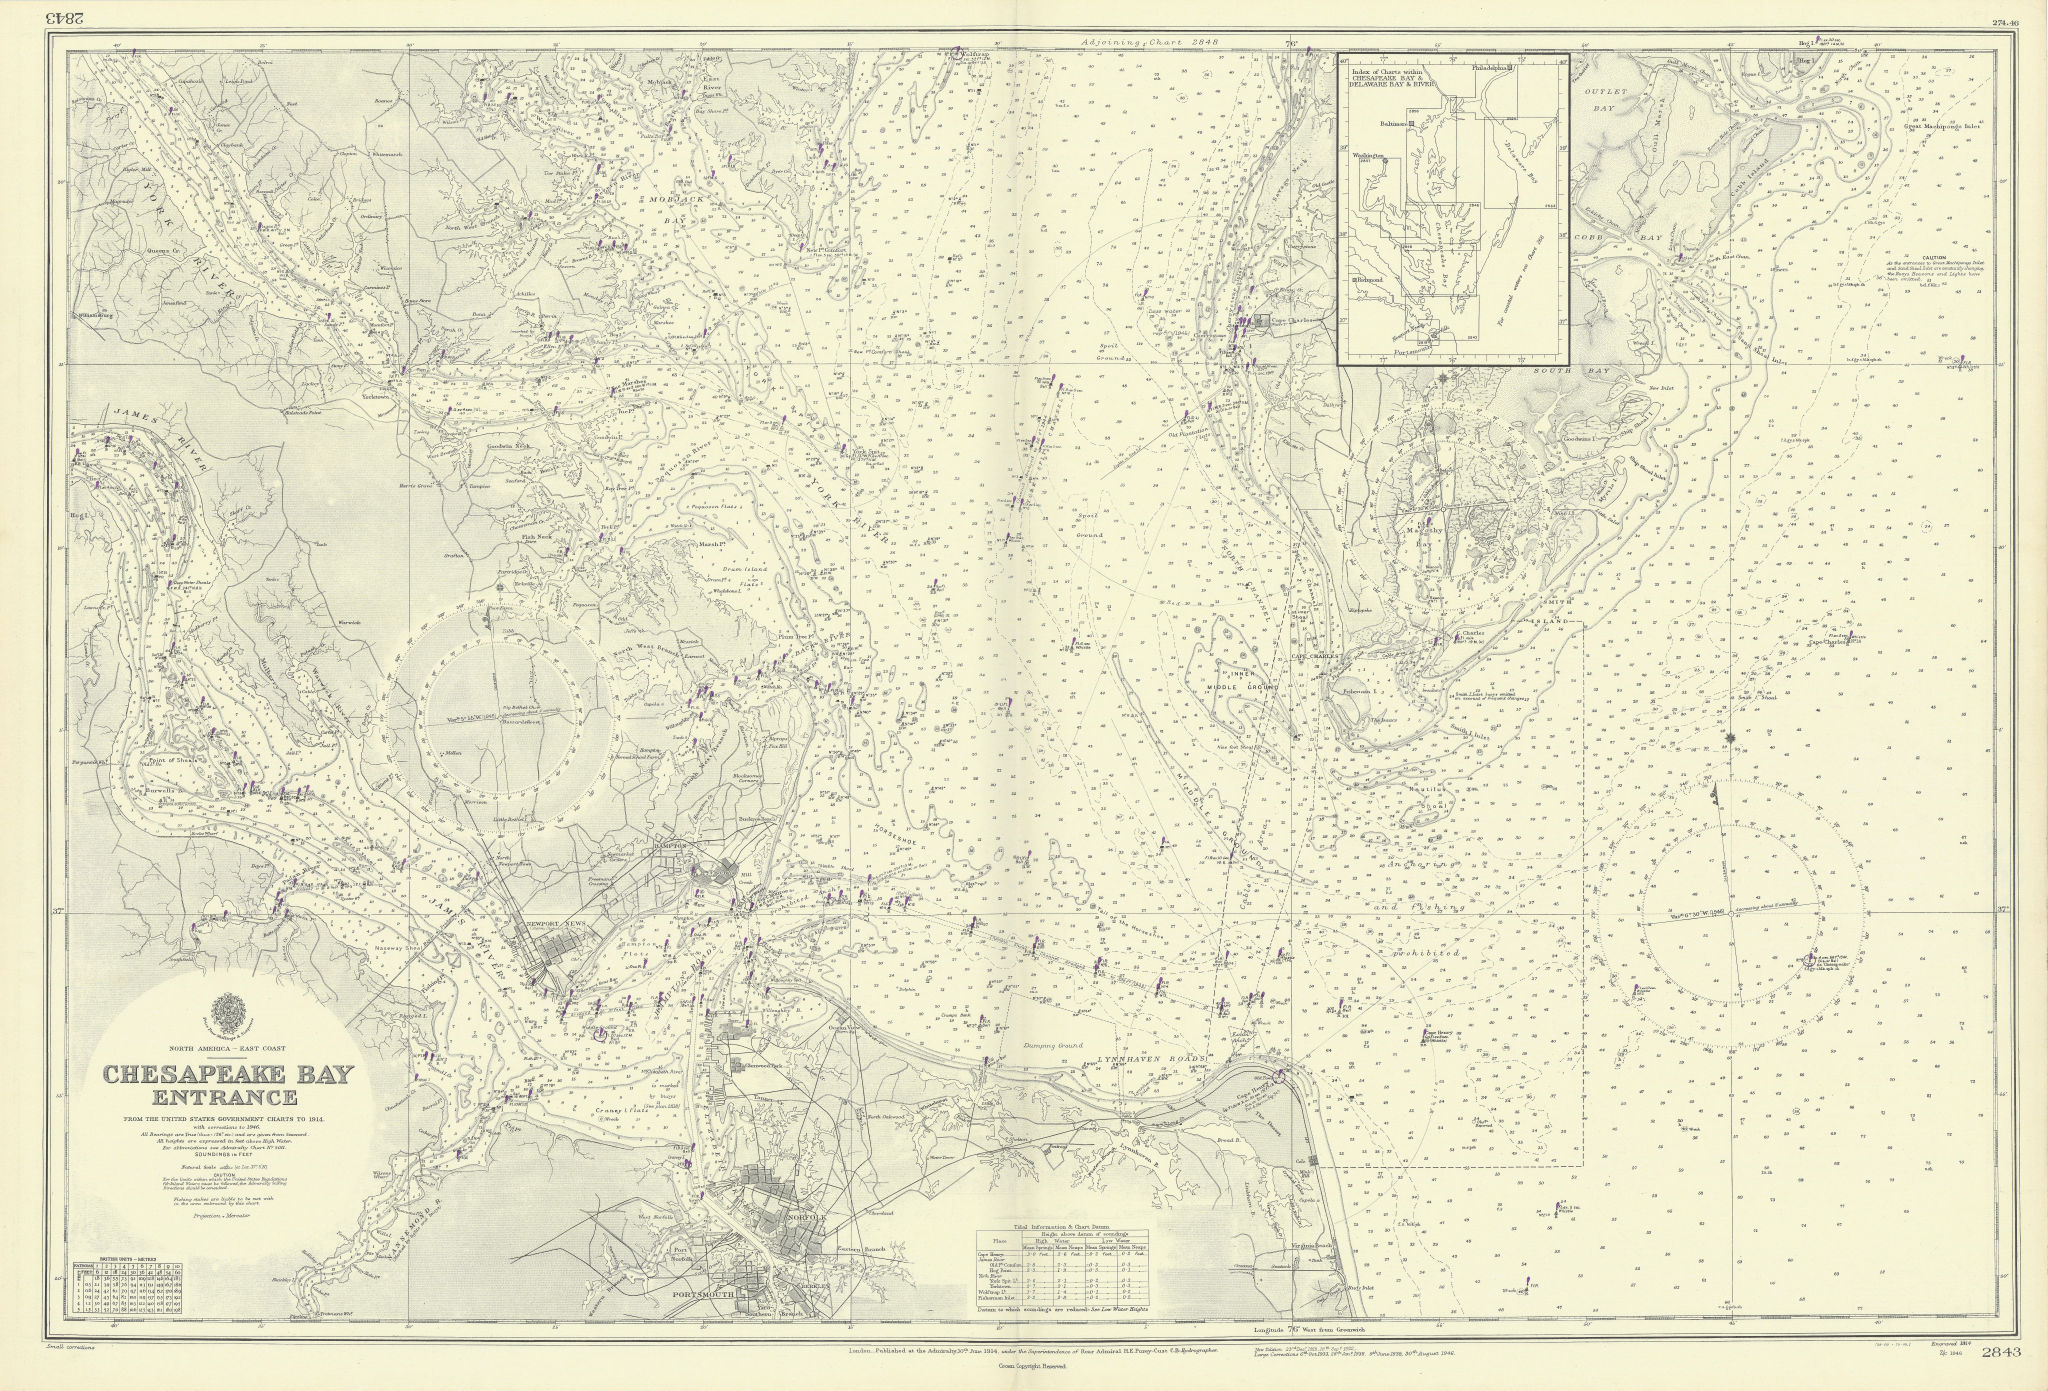 Chesapeake Bay entrance. Virginia Norfolk. ADMIRALTY sea chart 1914 (1946) map